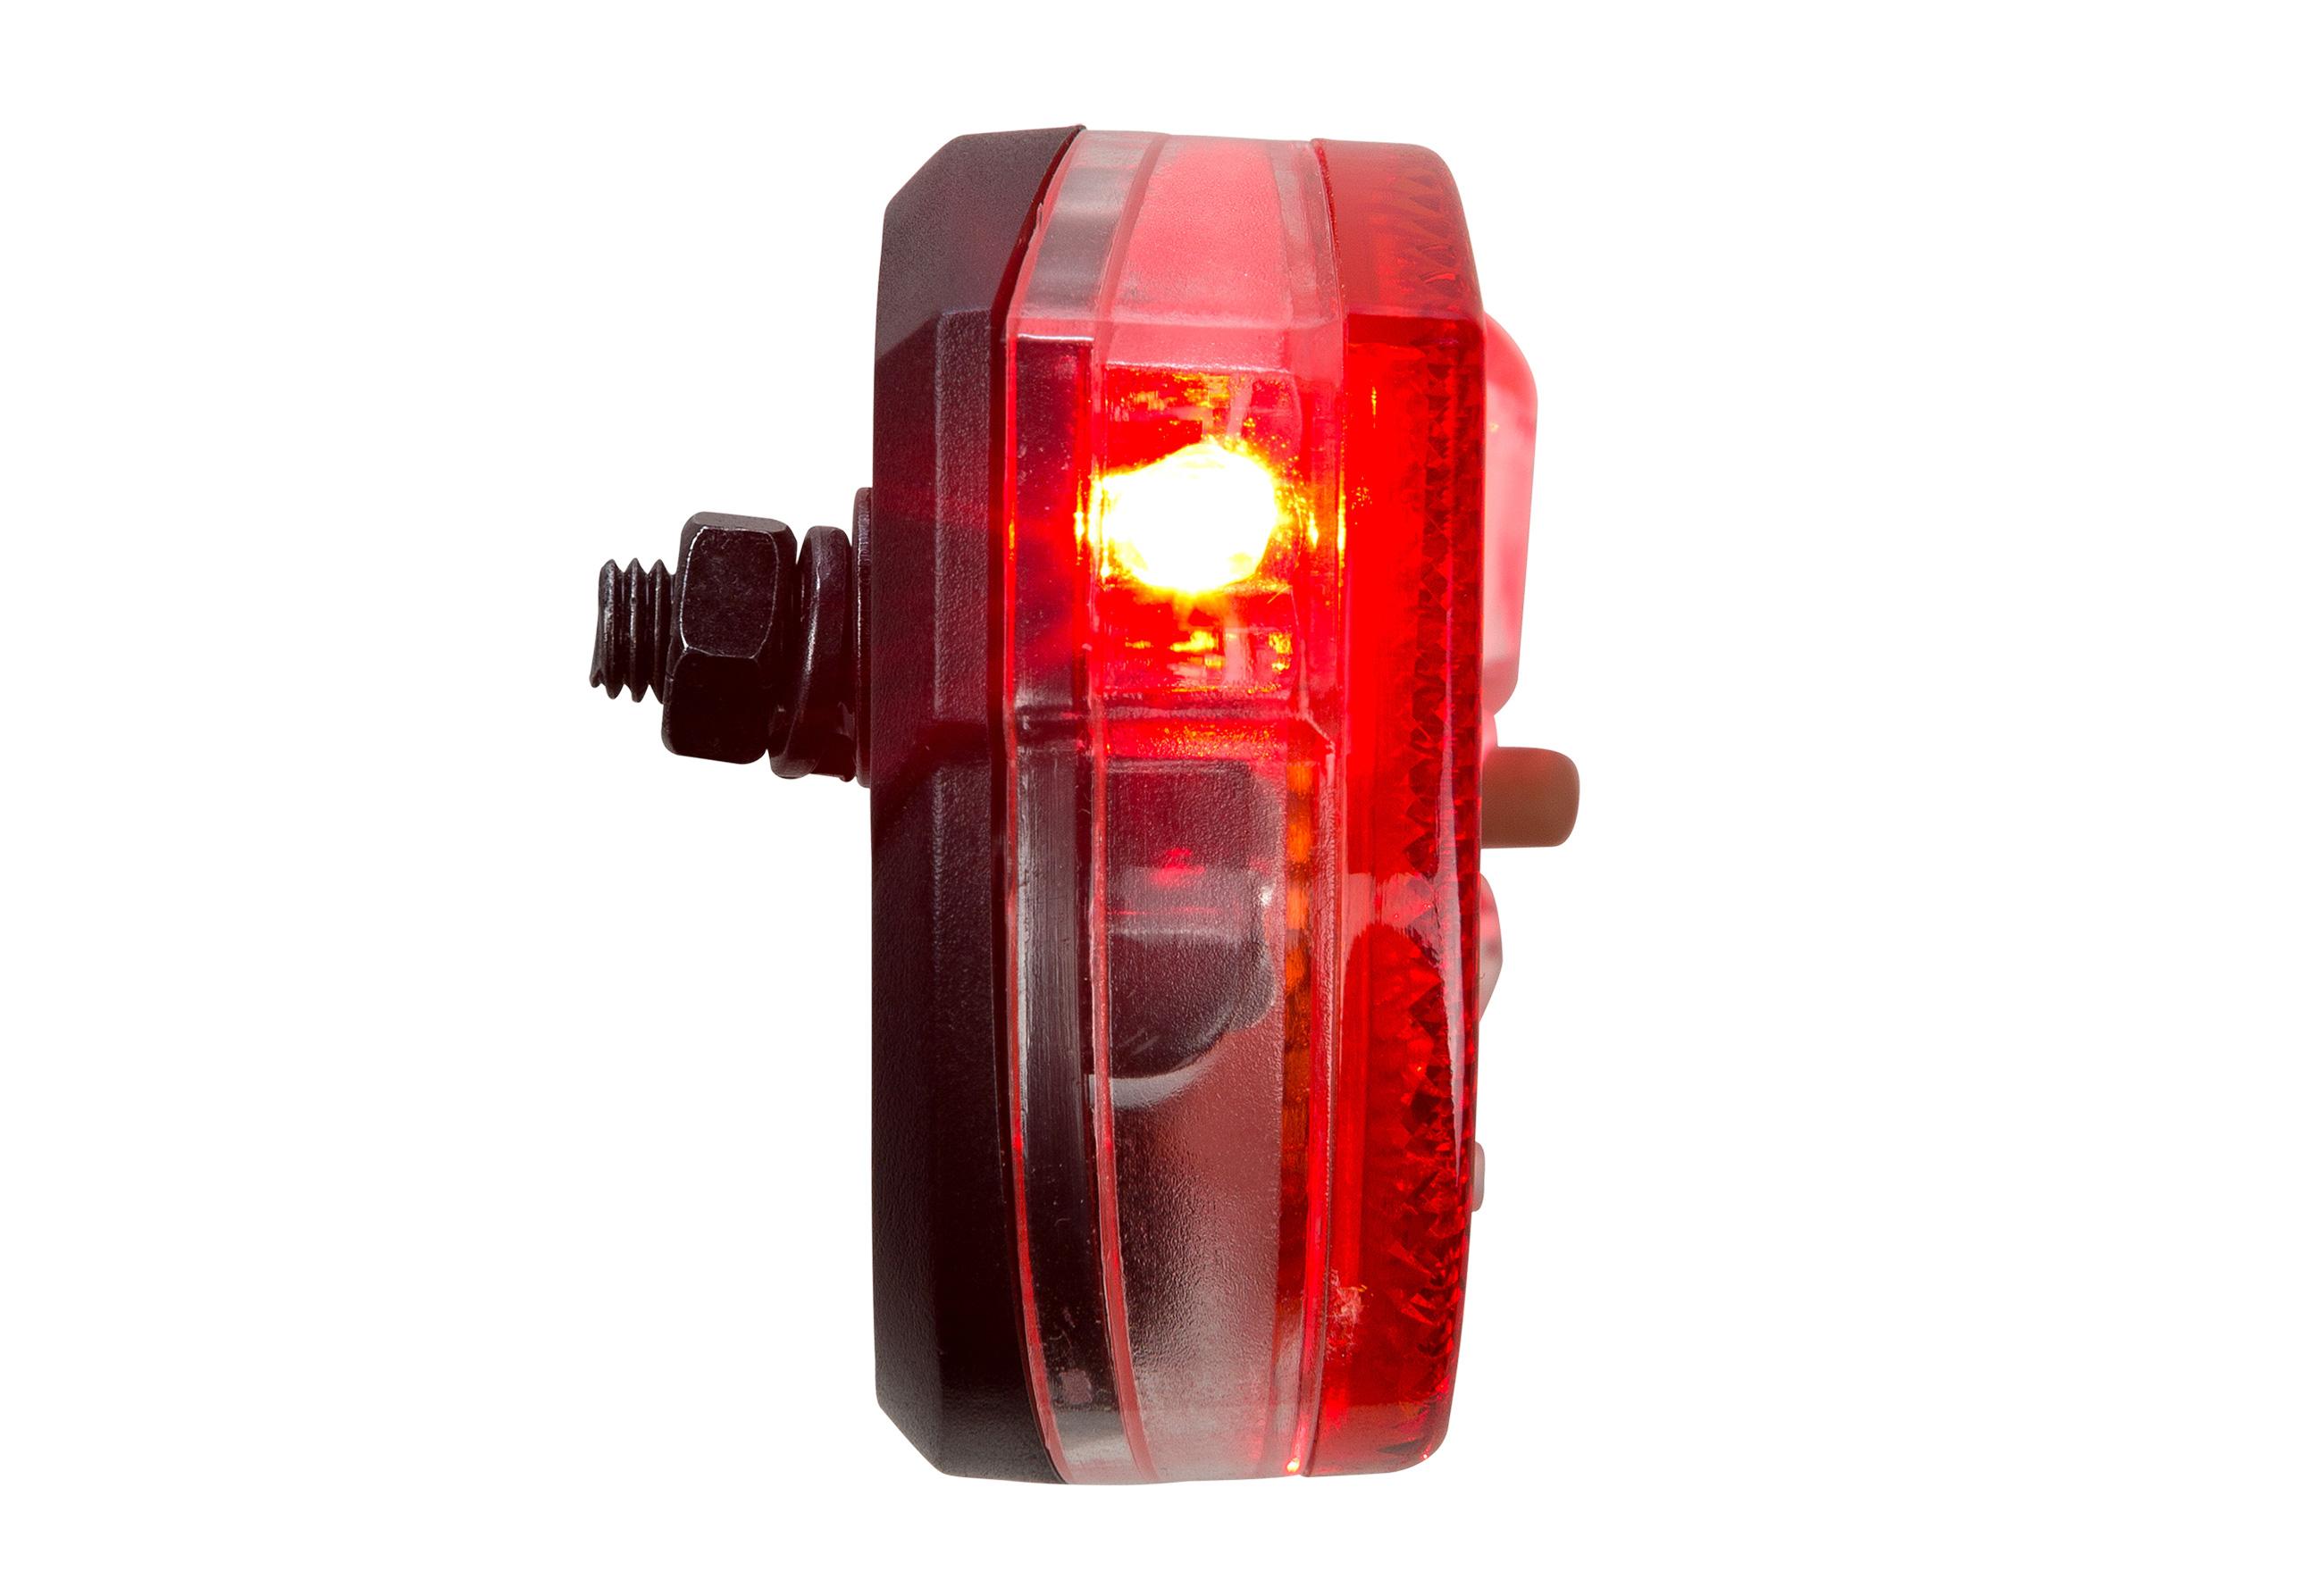 LAMPA ZA N.TERETA RFR STANDARD CUBE 13977